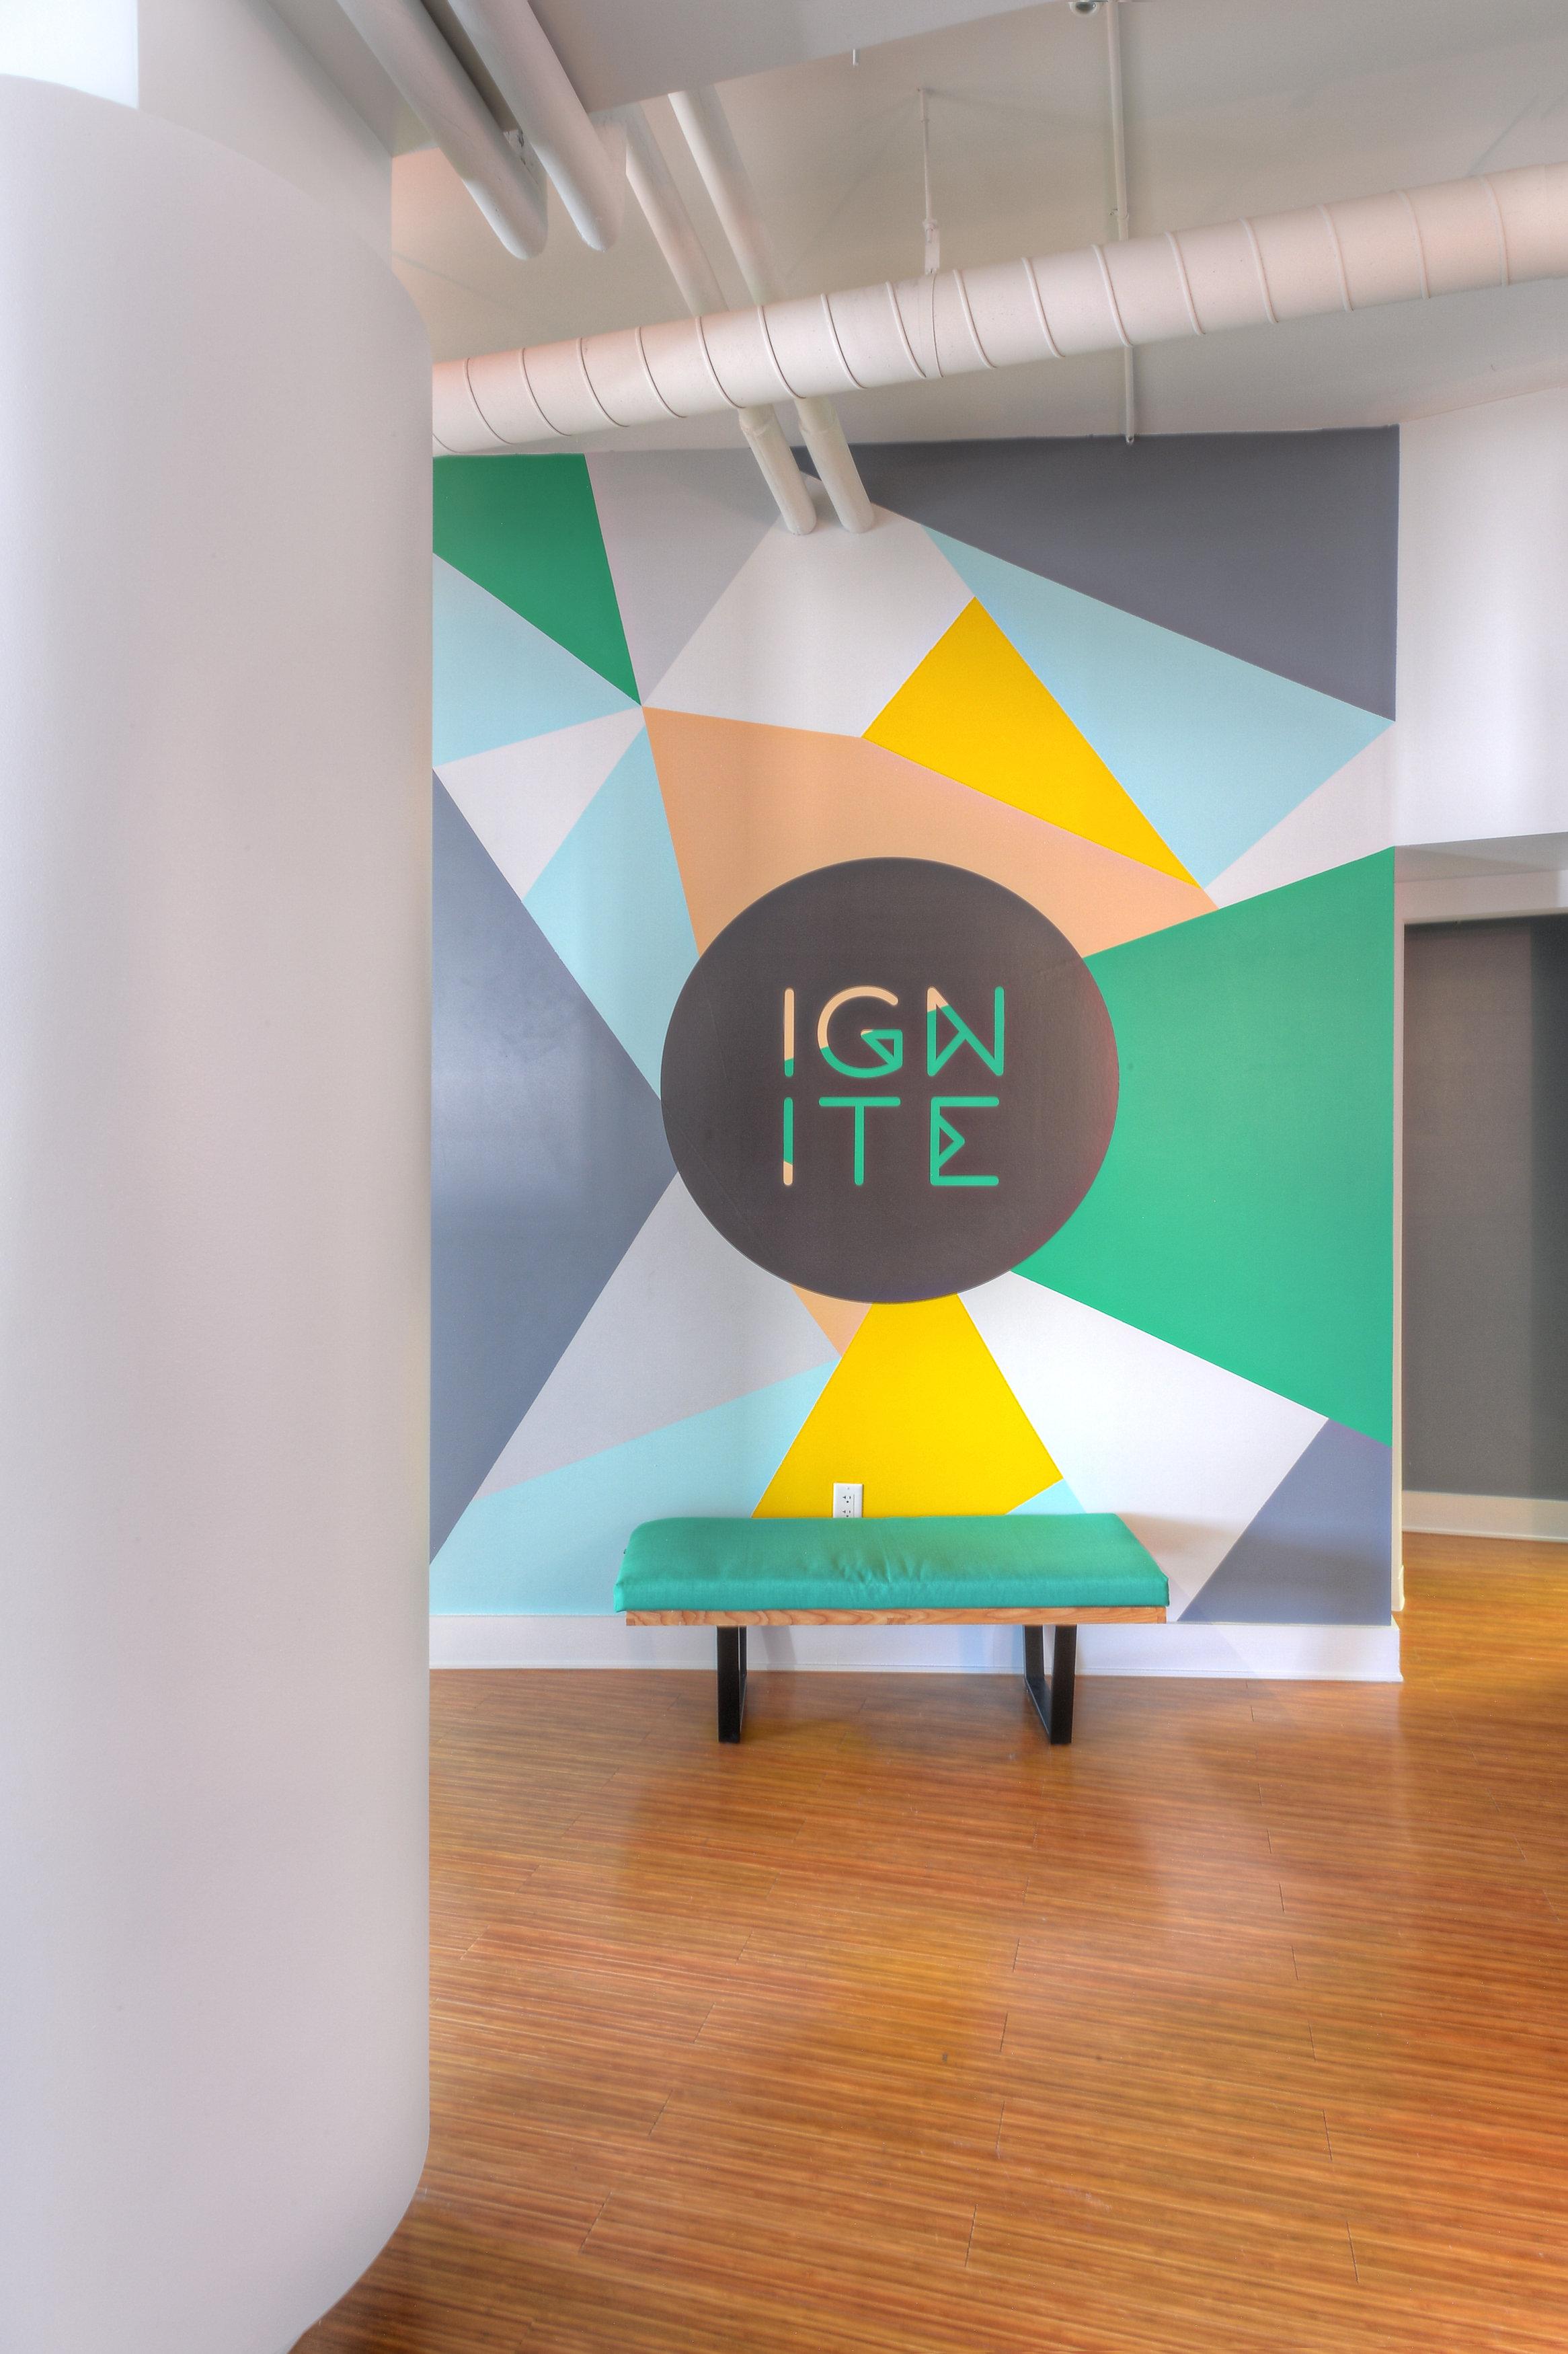 Ignite-0017.jpg